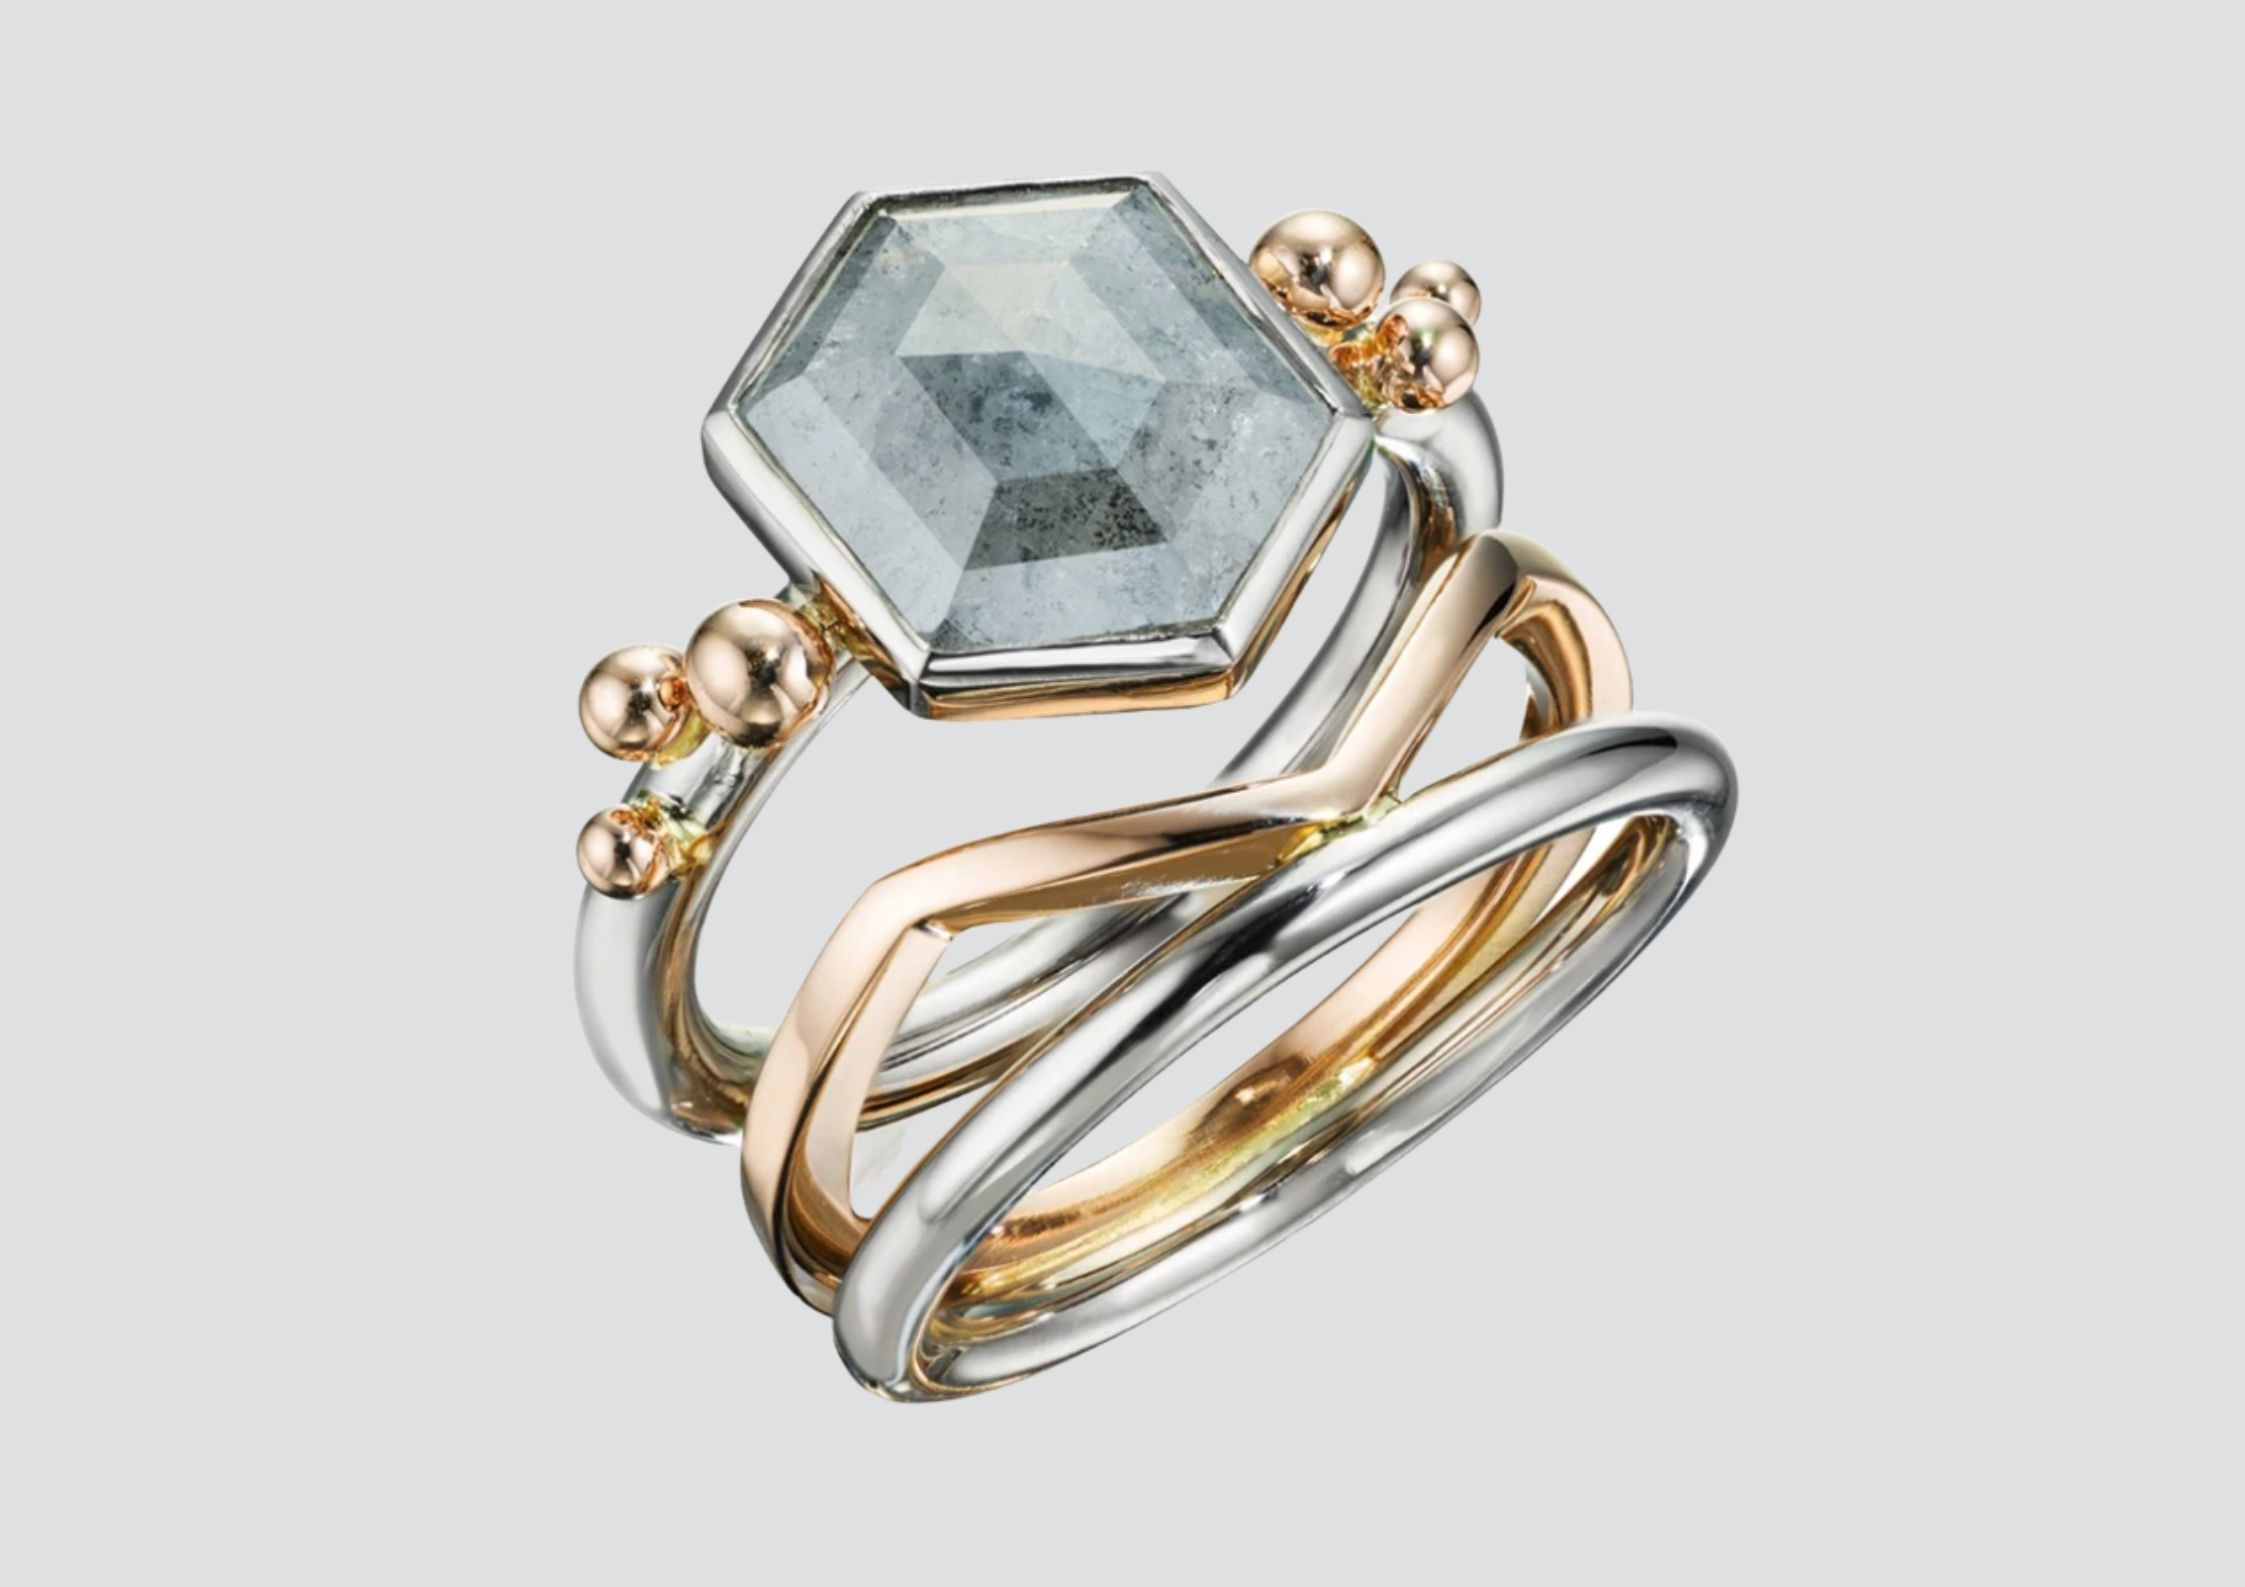 https://shop.jewellerycut.com/collections/charlotte-cornelius